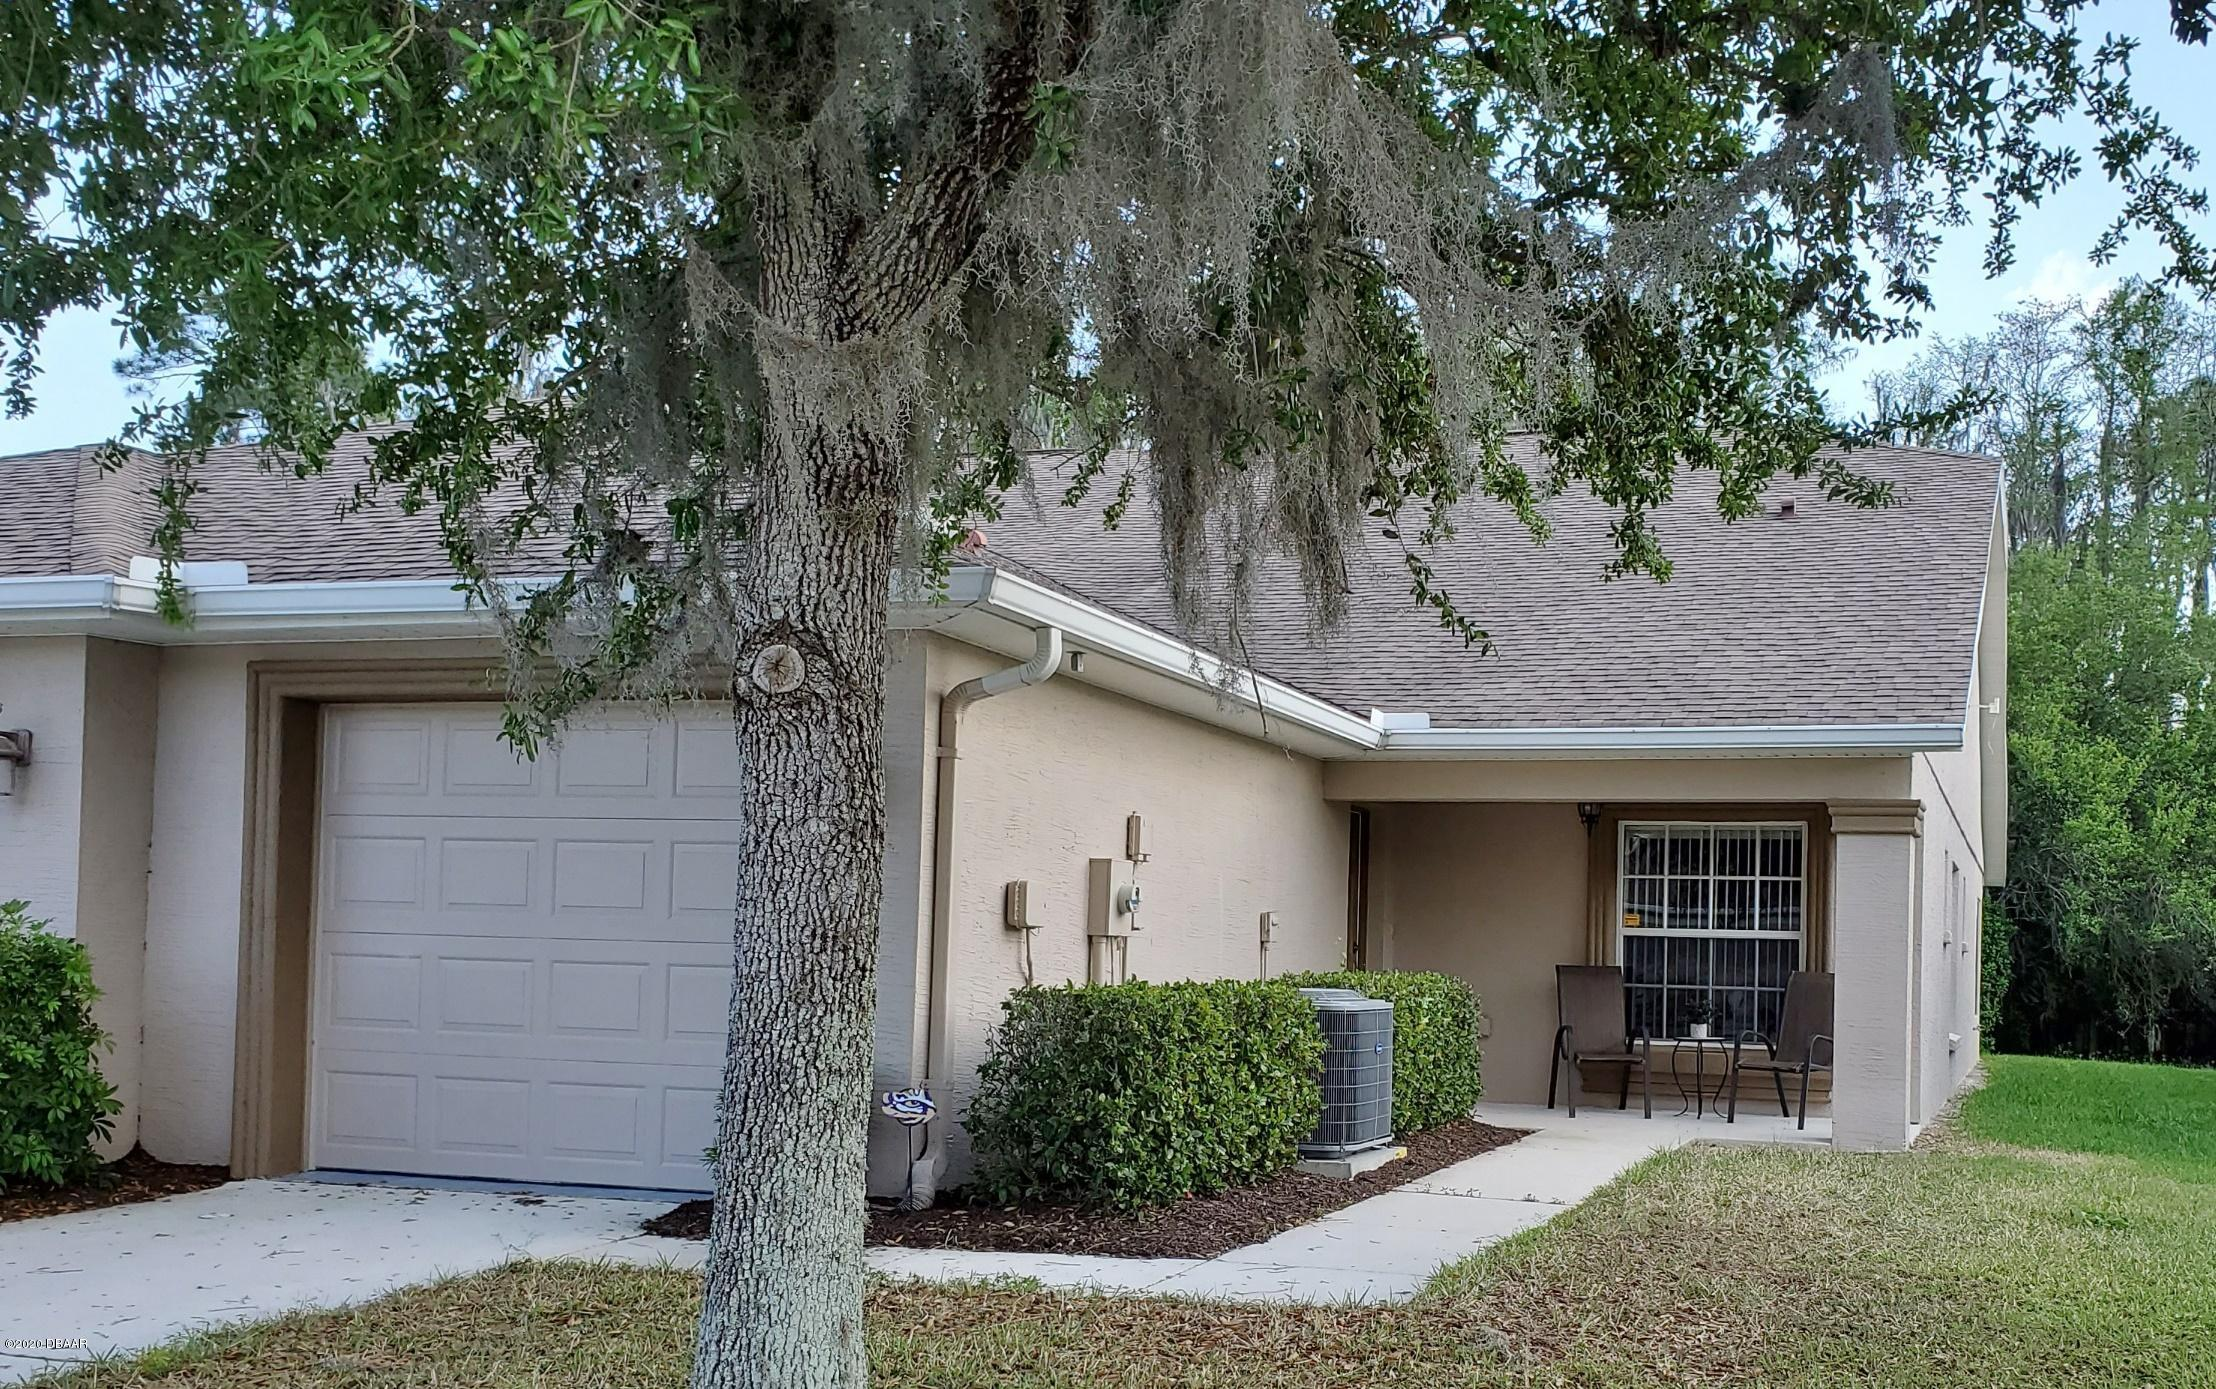 Photo of 1631 Areca Palm Drive, Port Orange, FL 32128